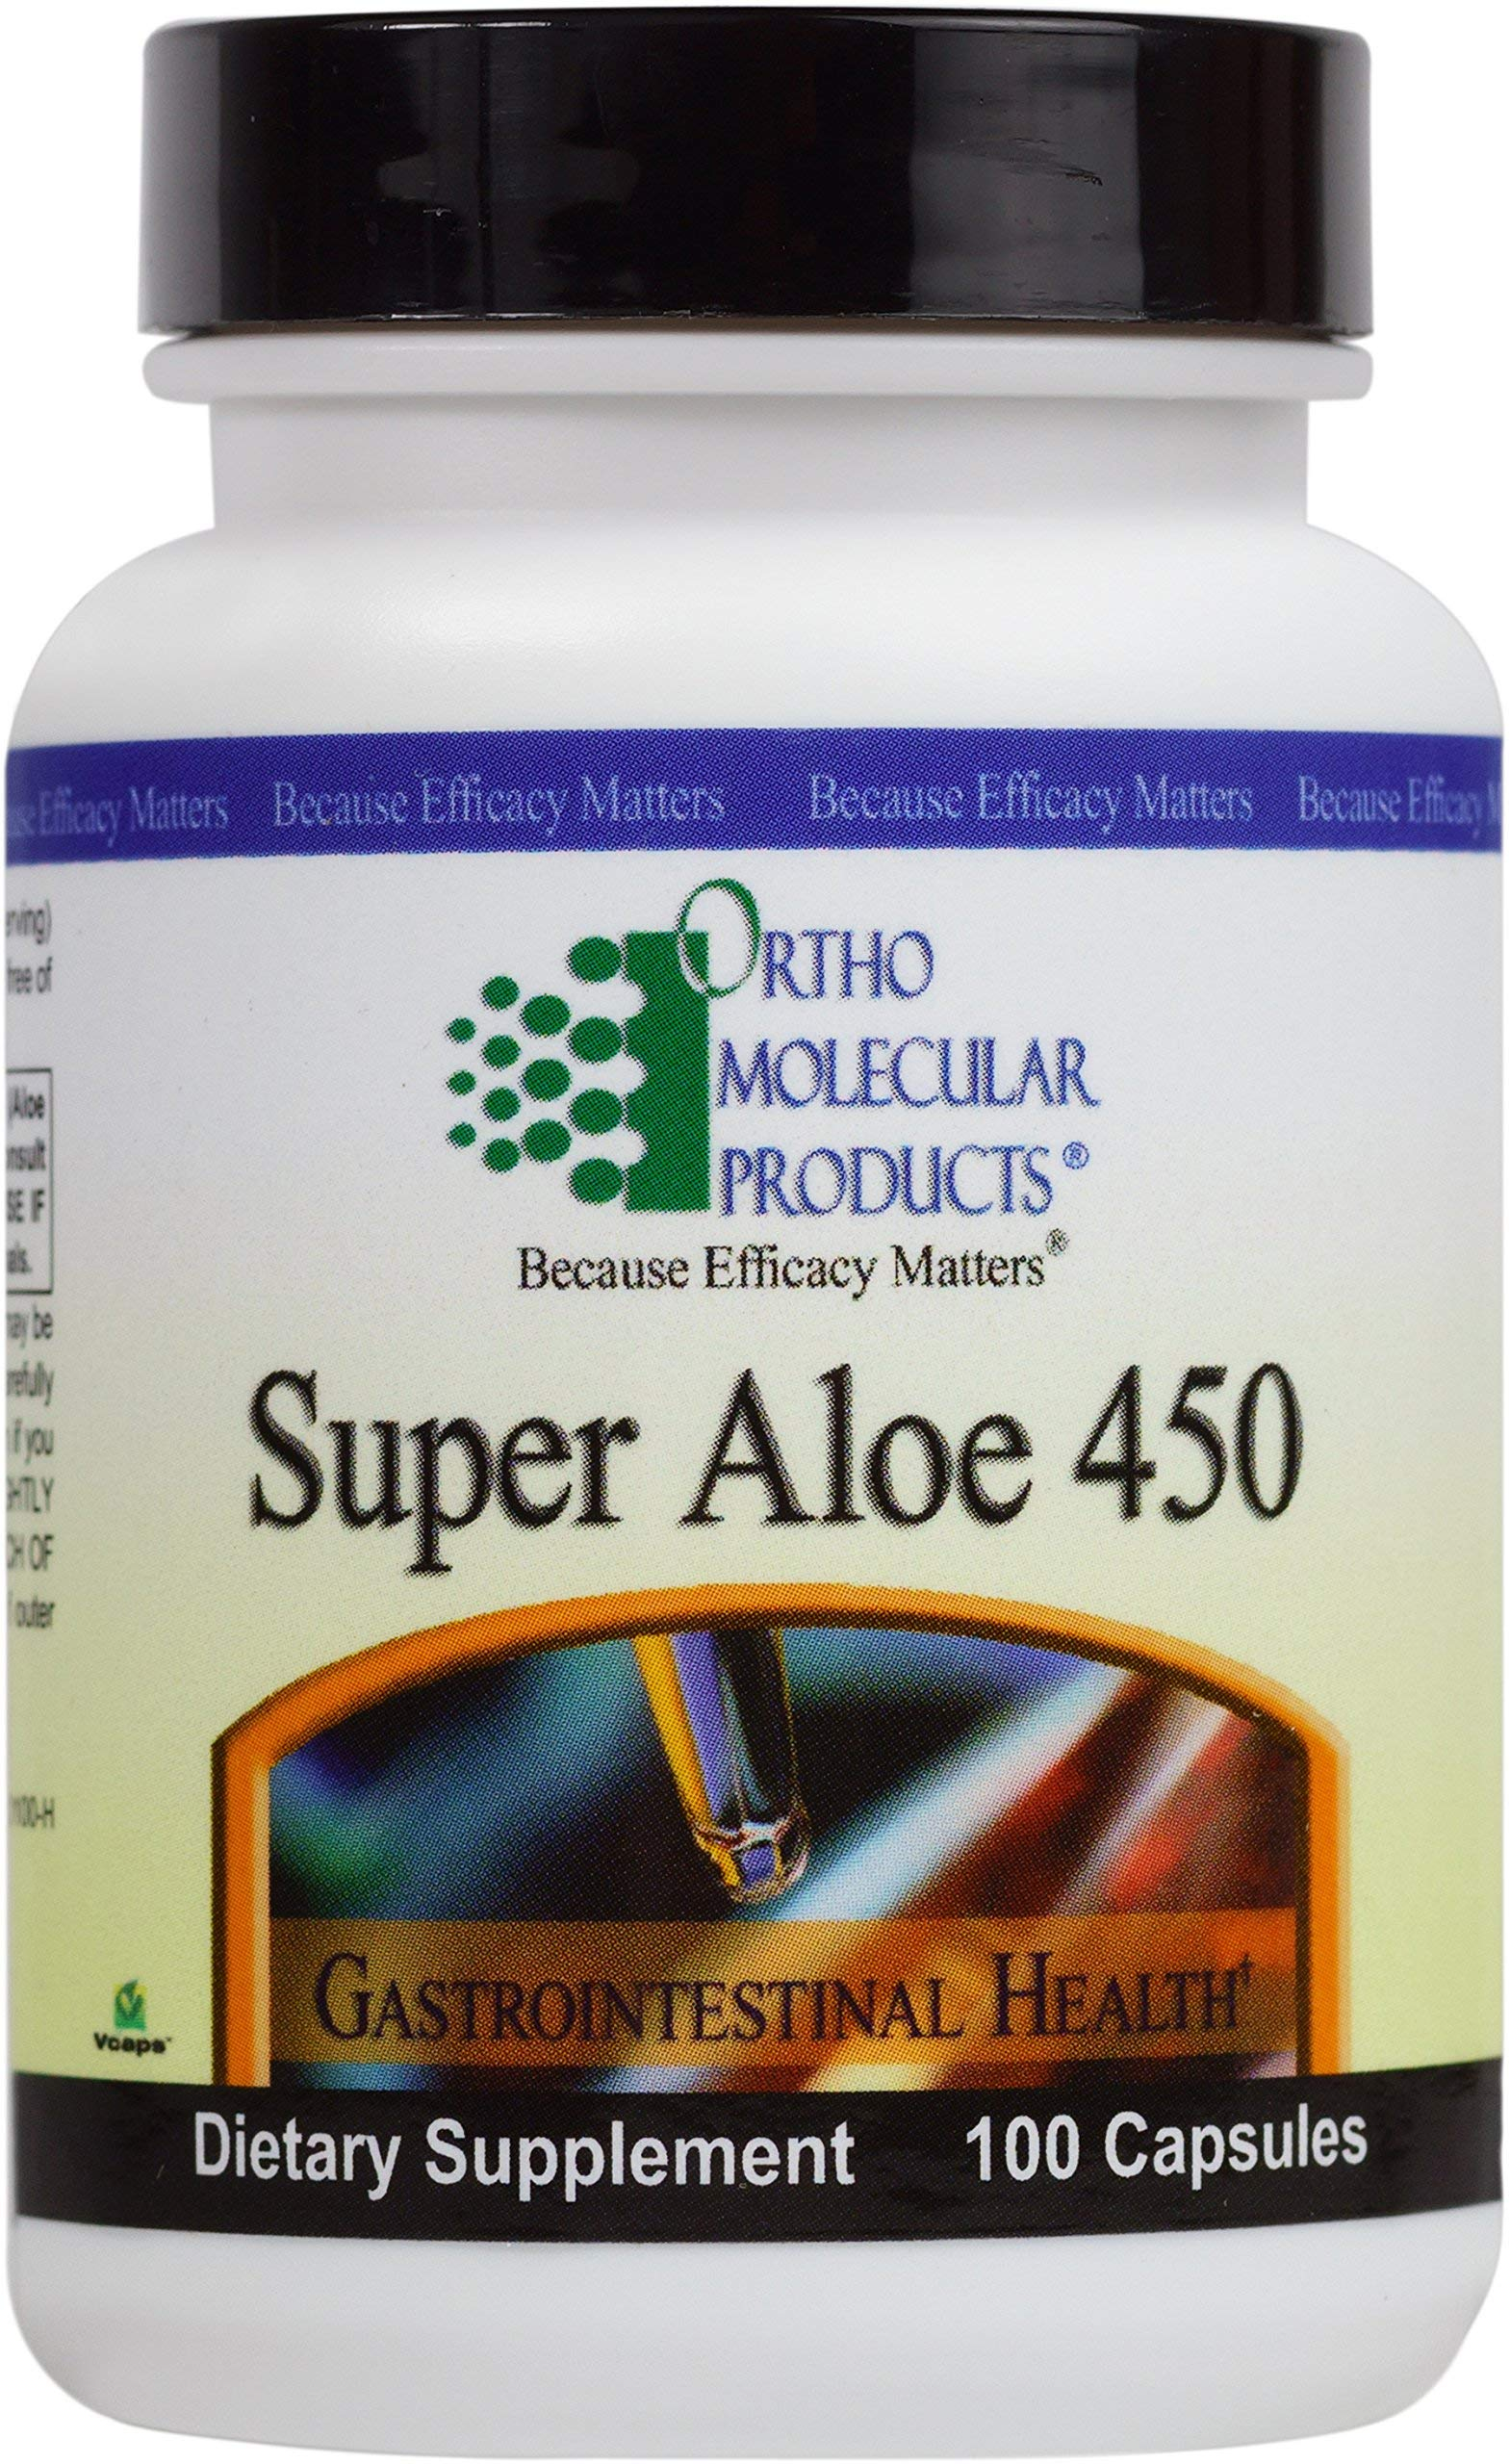 Ortho Molecular - Super Aloe 450 - 100 Capsules